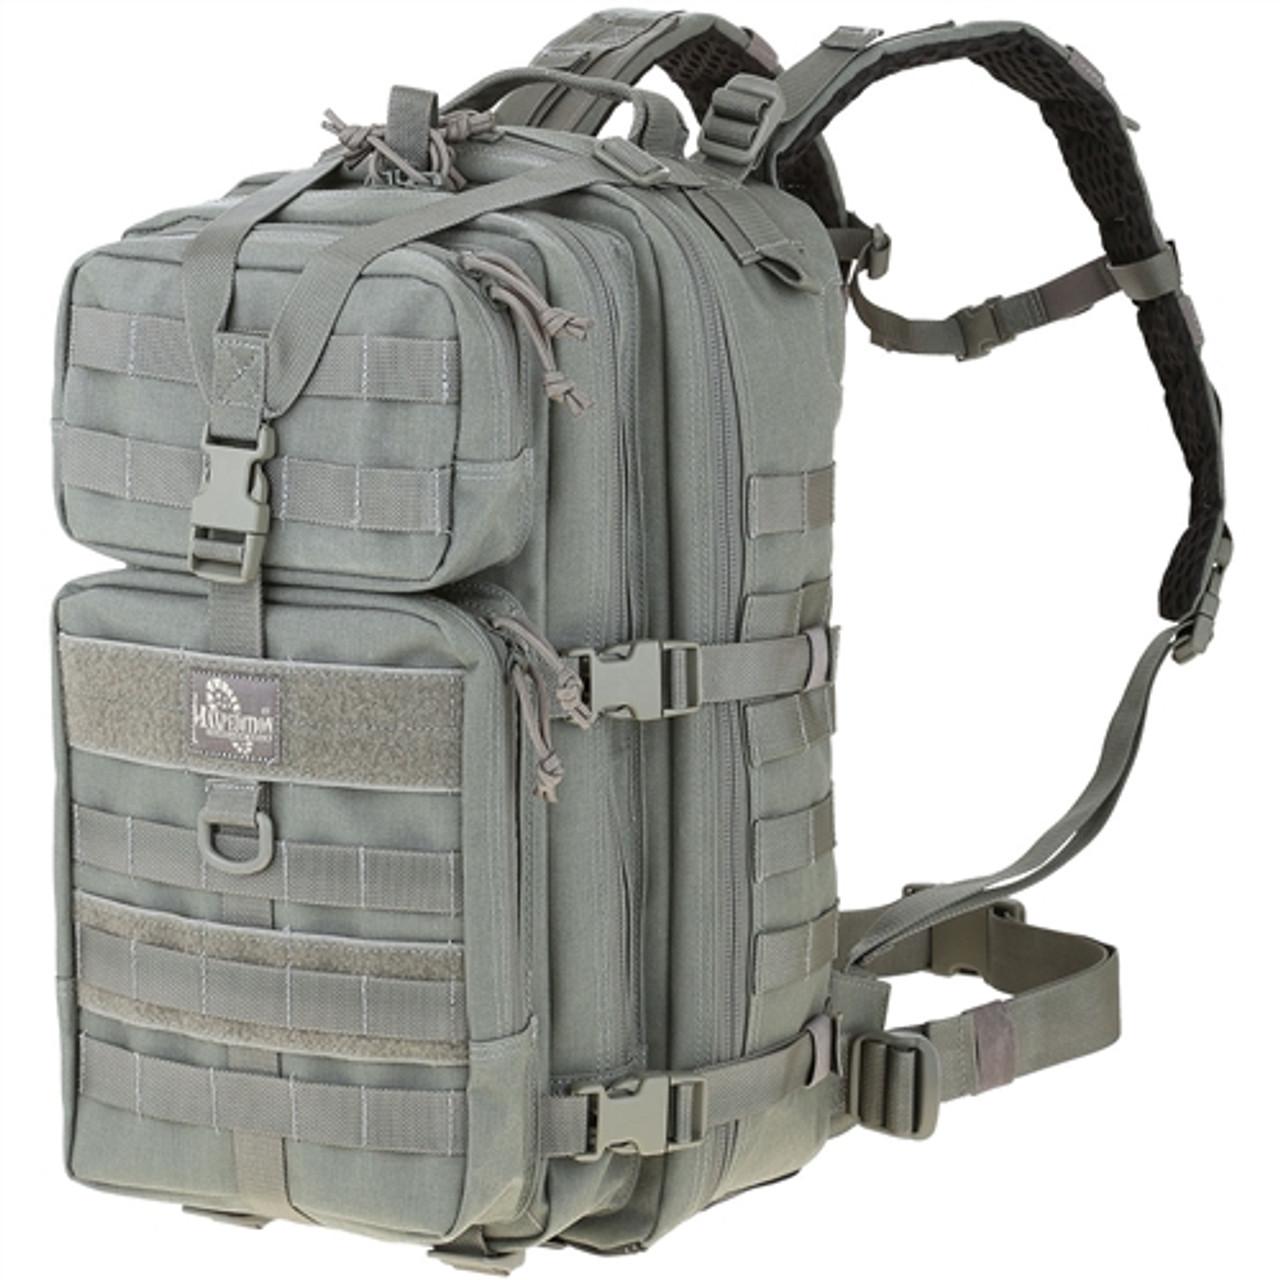 Maxpedition Falcon III Backpack, Foliage Green